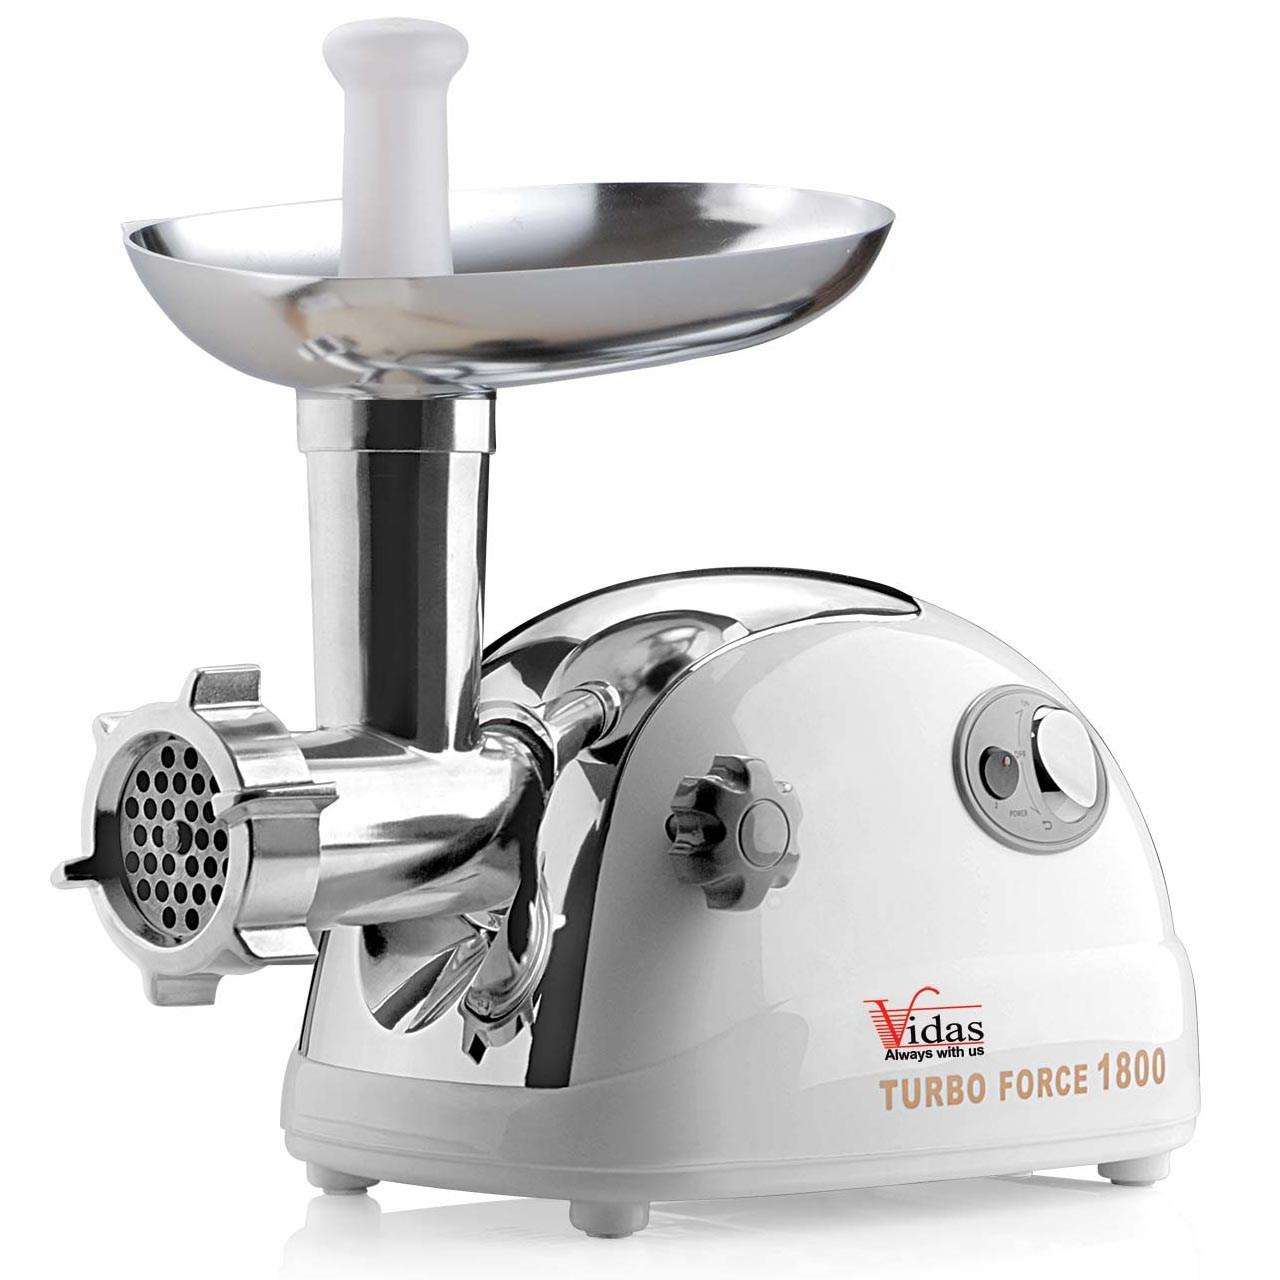 چرخ گوشت 1800 وات ویداس مدل VIR-3505